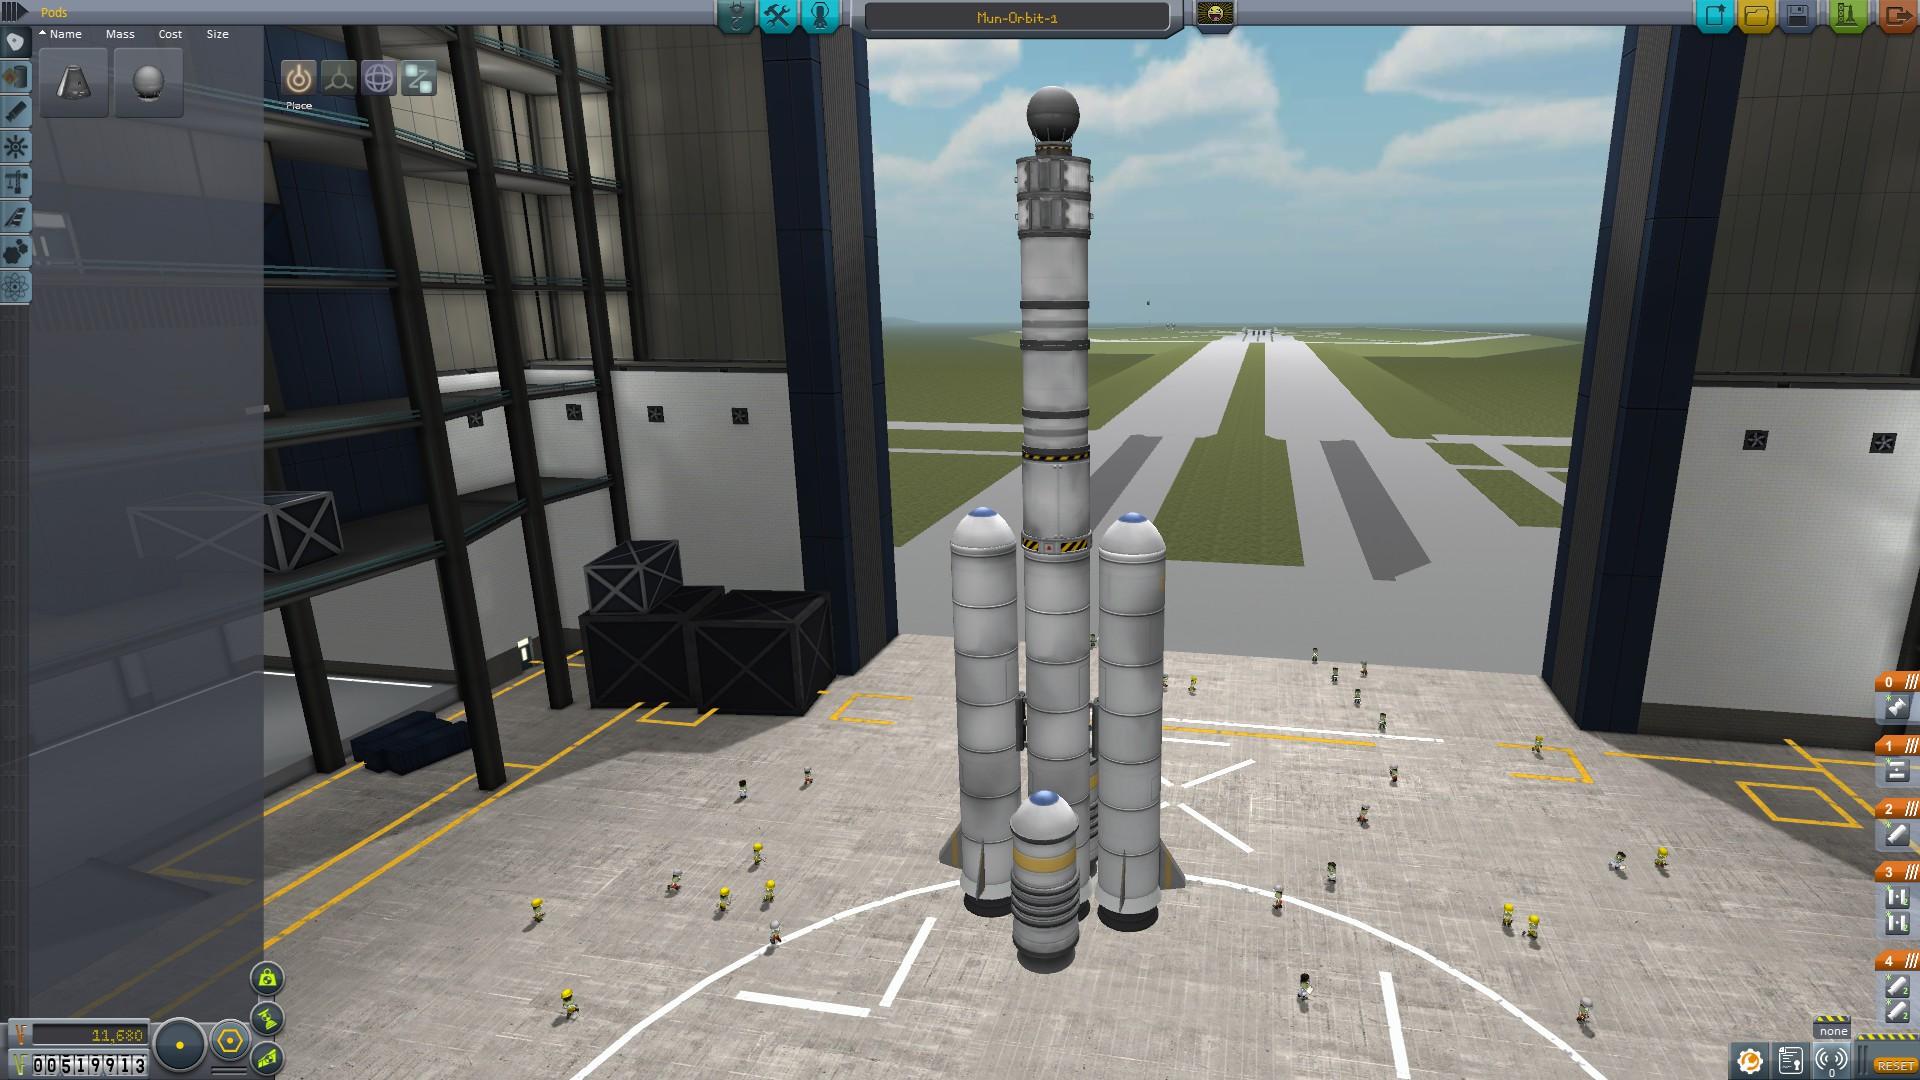 Kerbal Space Program v1 0: No Longer Prematurely Deployed